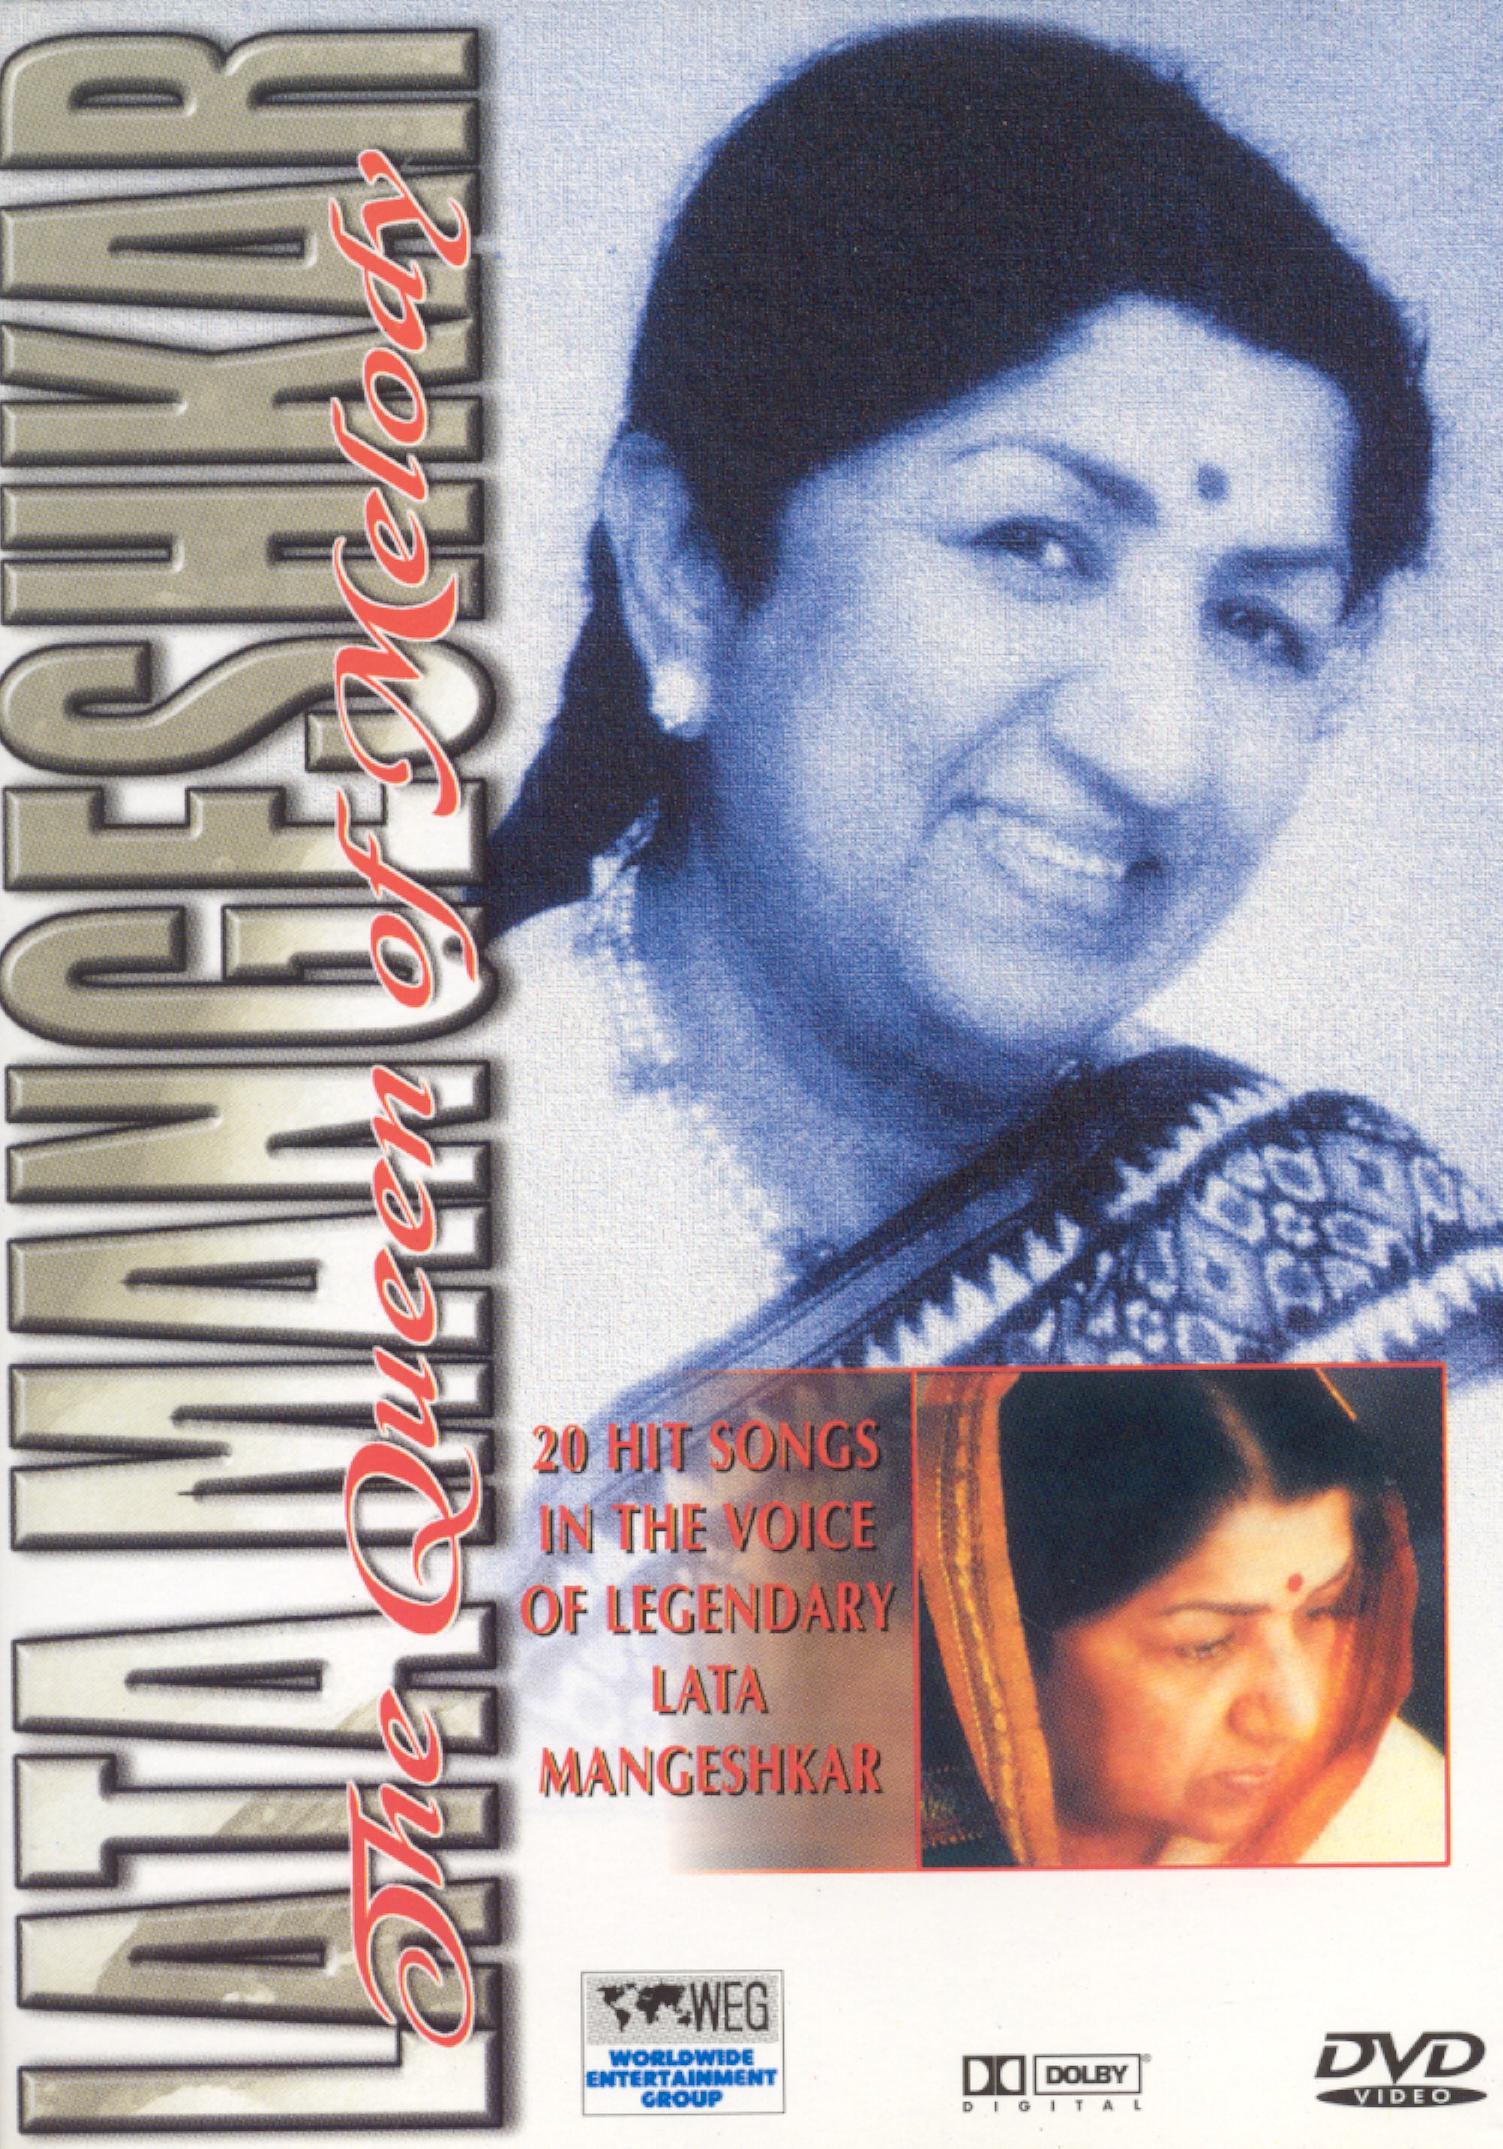 Lata Mangeshkar: The Queen of Melody